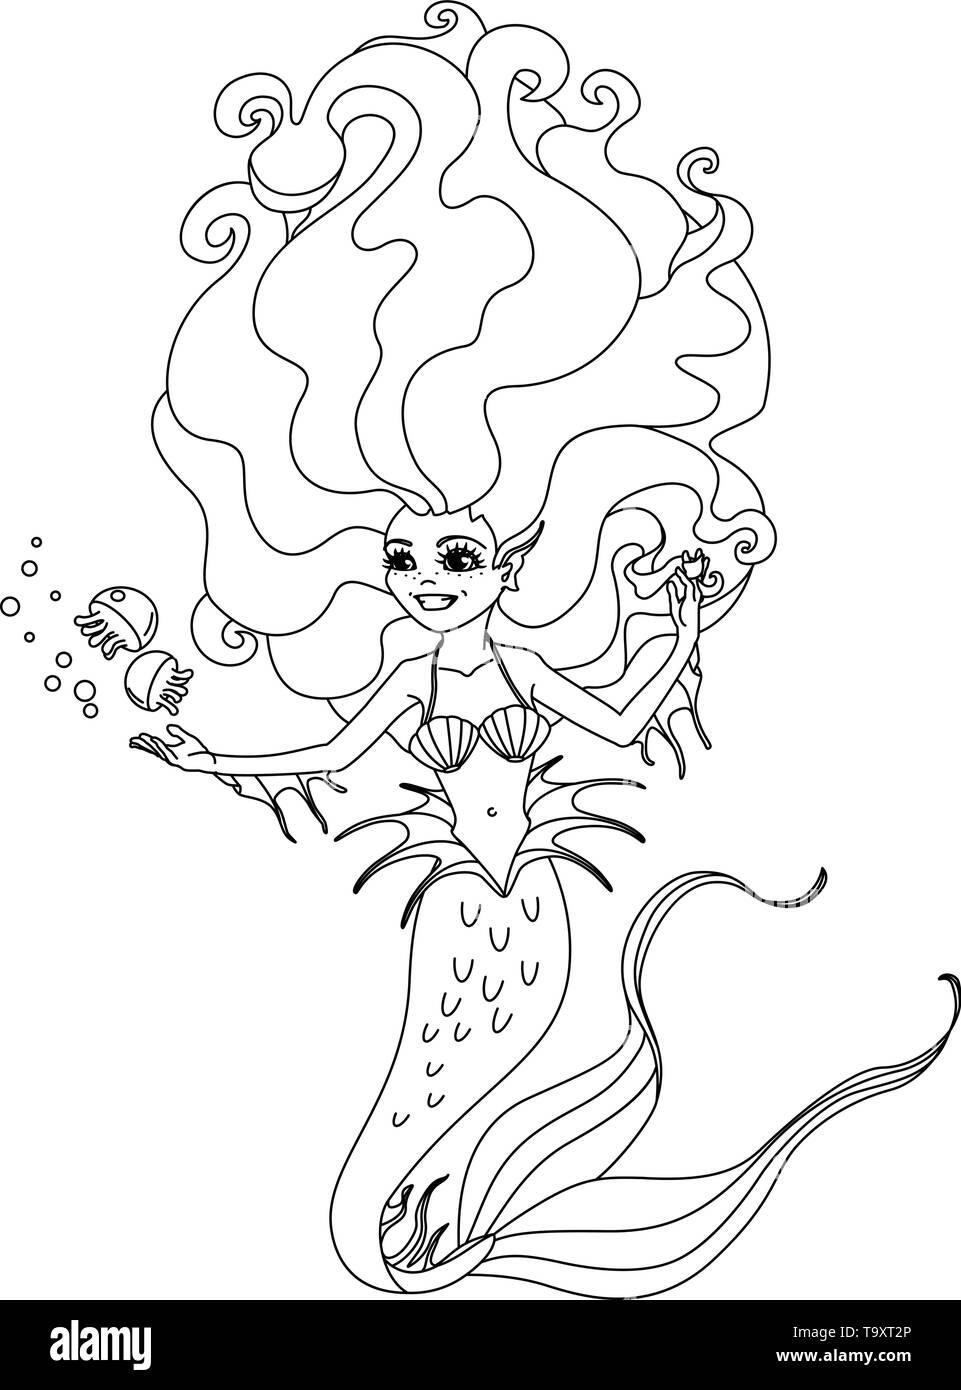 vectorr black, white outline cartoon cute mermaid Fairy sea - Stock Image